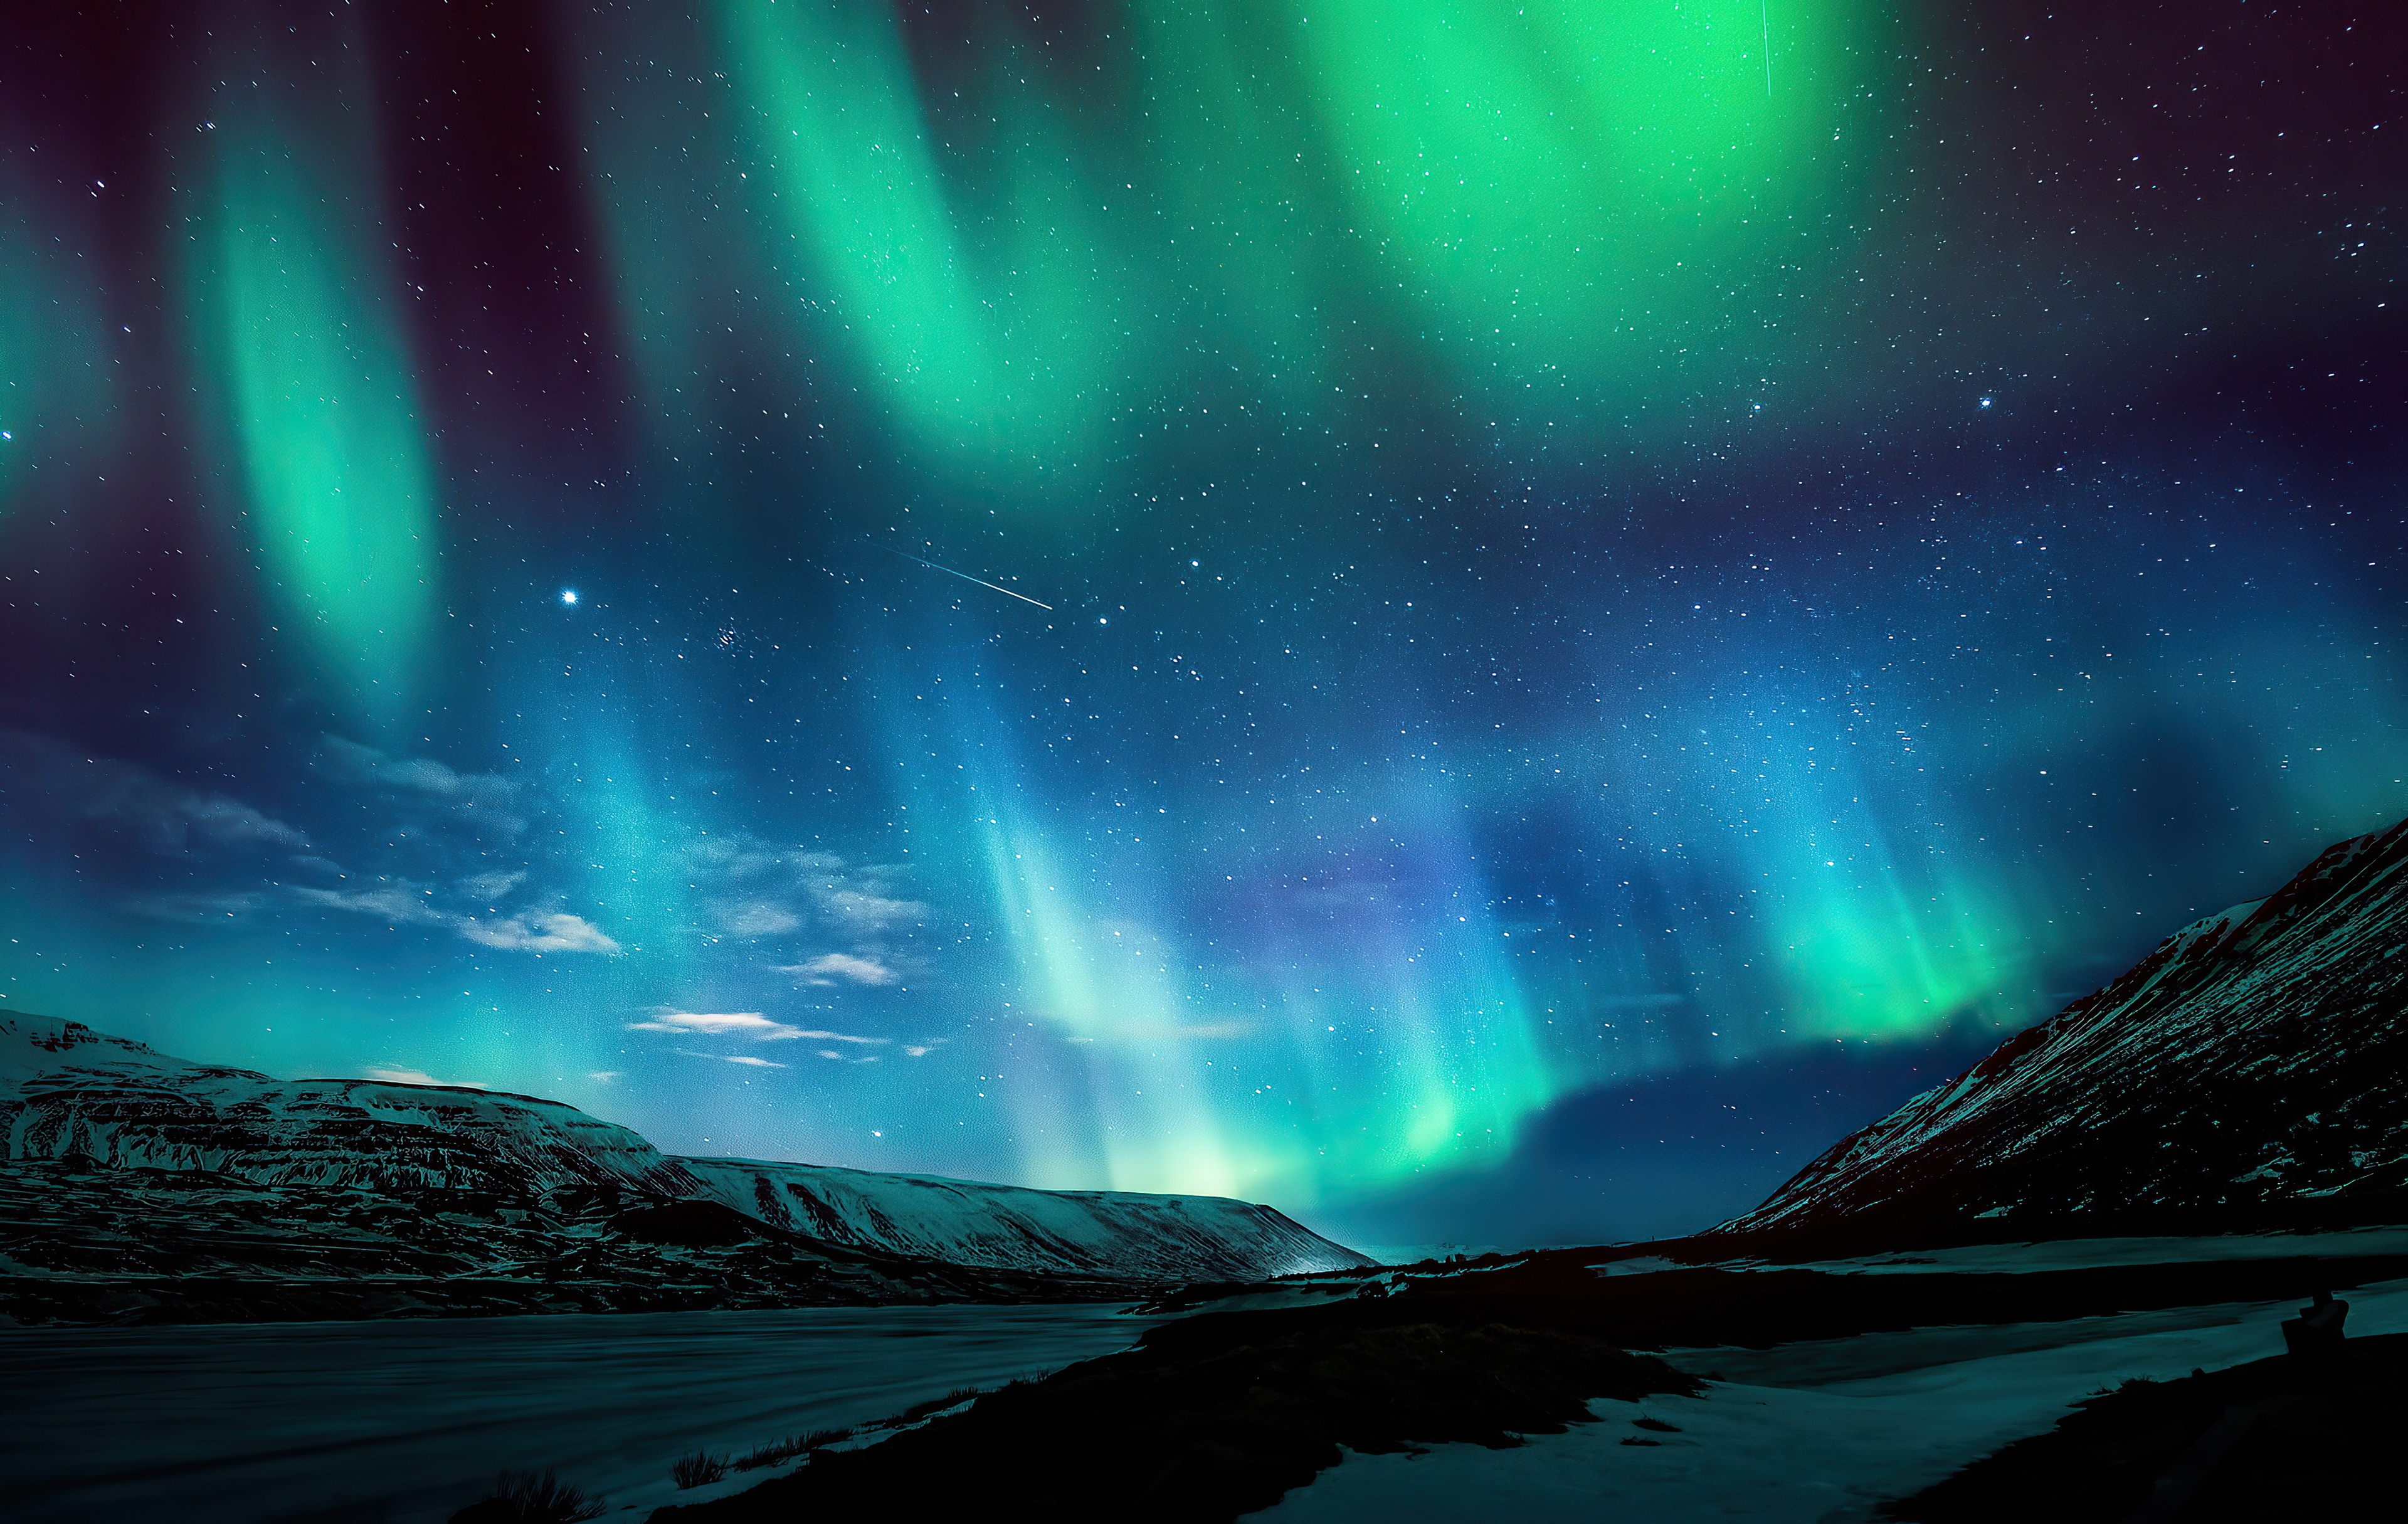 aurora borealis northern lights 4k 1602533934 - Aurora Borealis Northern Lights 4k - Aurora Borealis Northern Lights 4k wallpapers